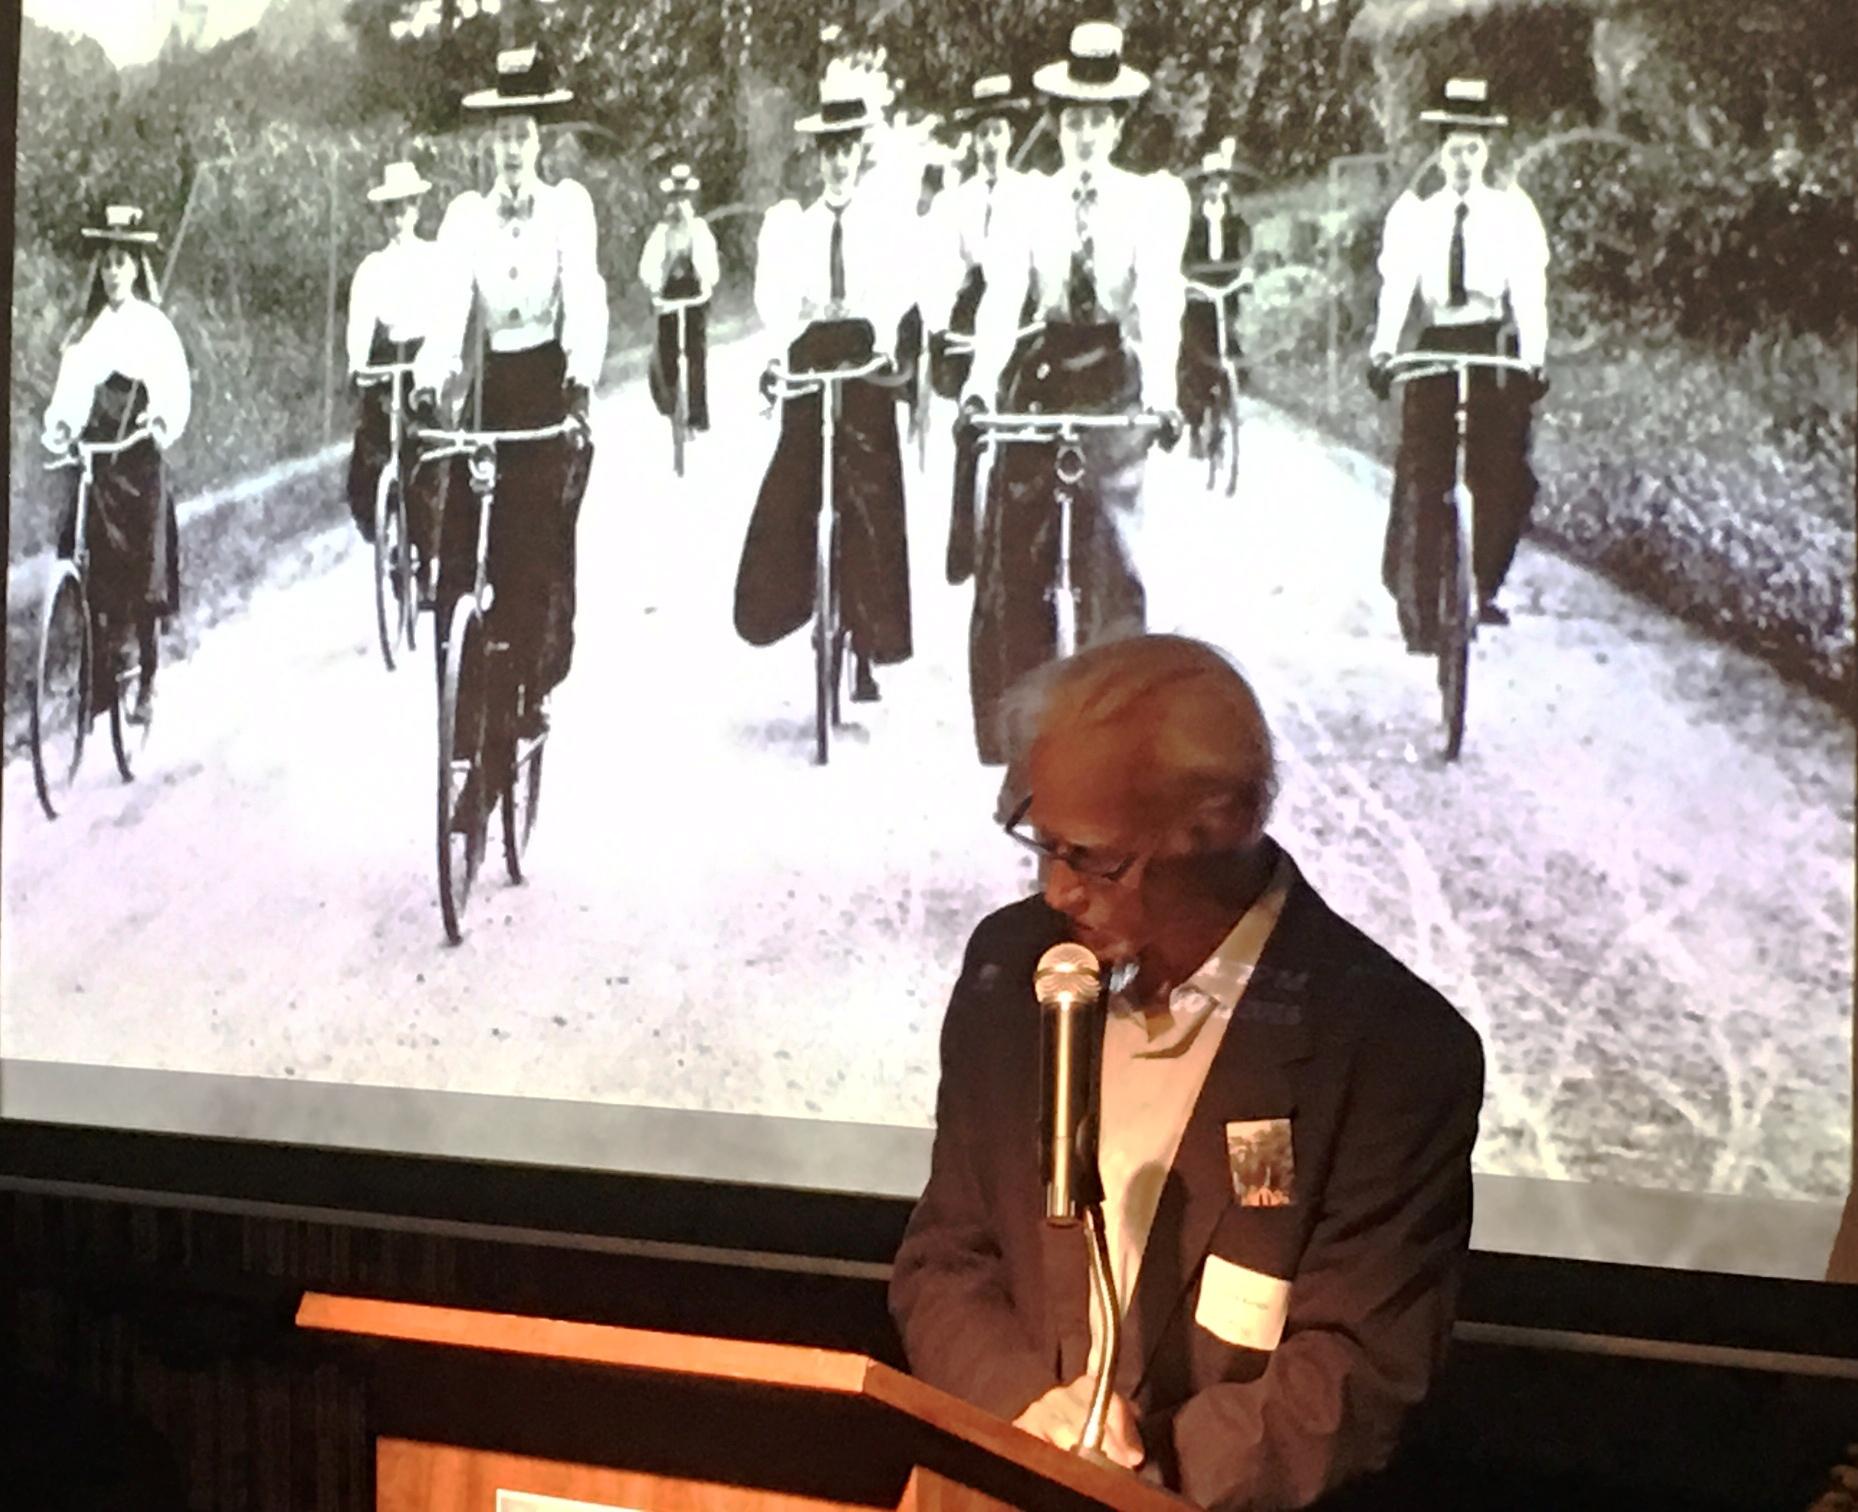 2016 Mountain Bike Hall of Fame Inductee